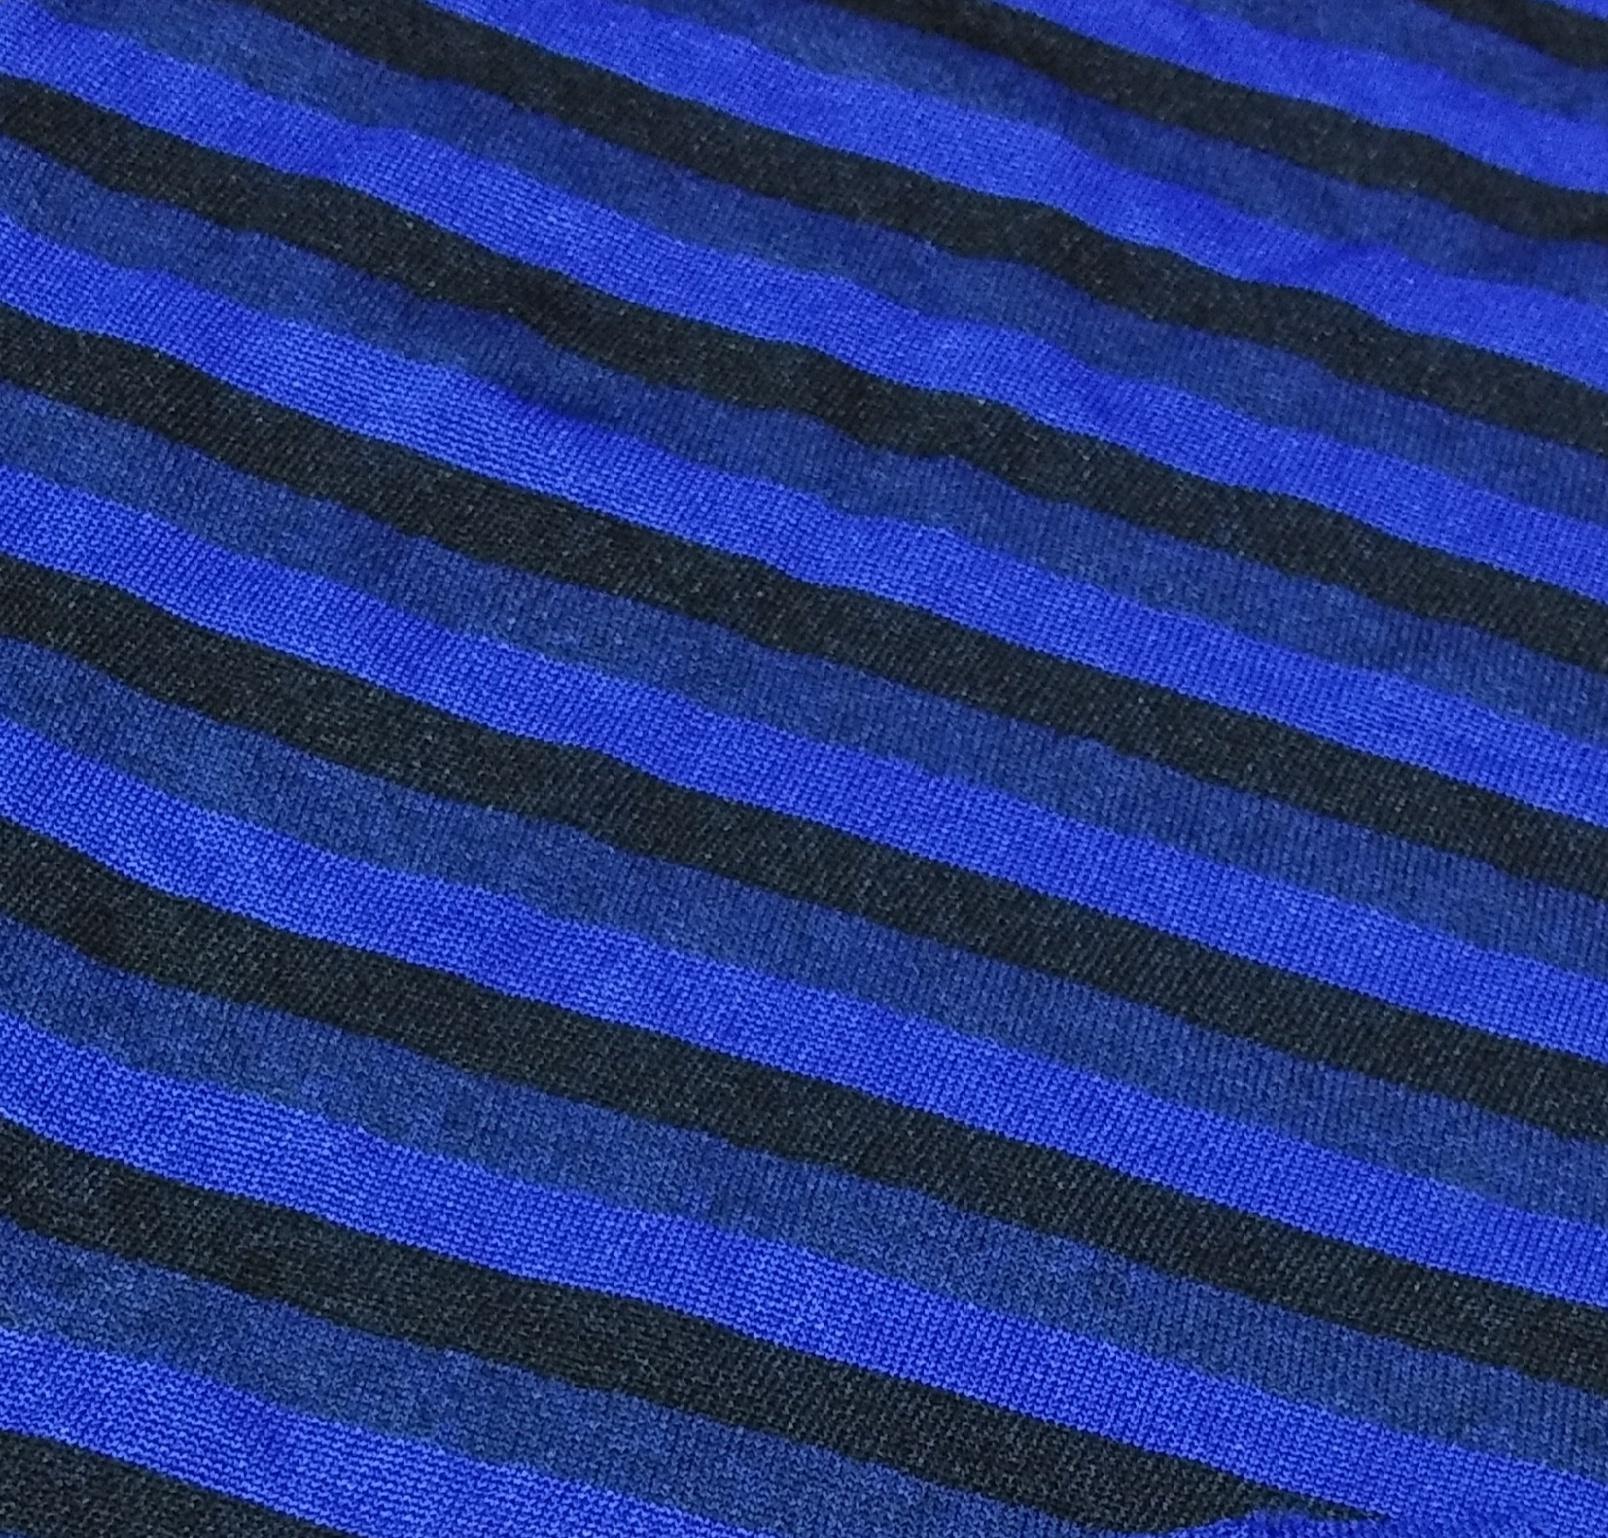 Magic Patta Fabric